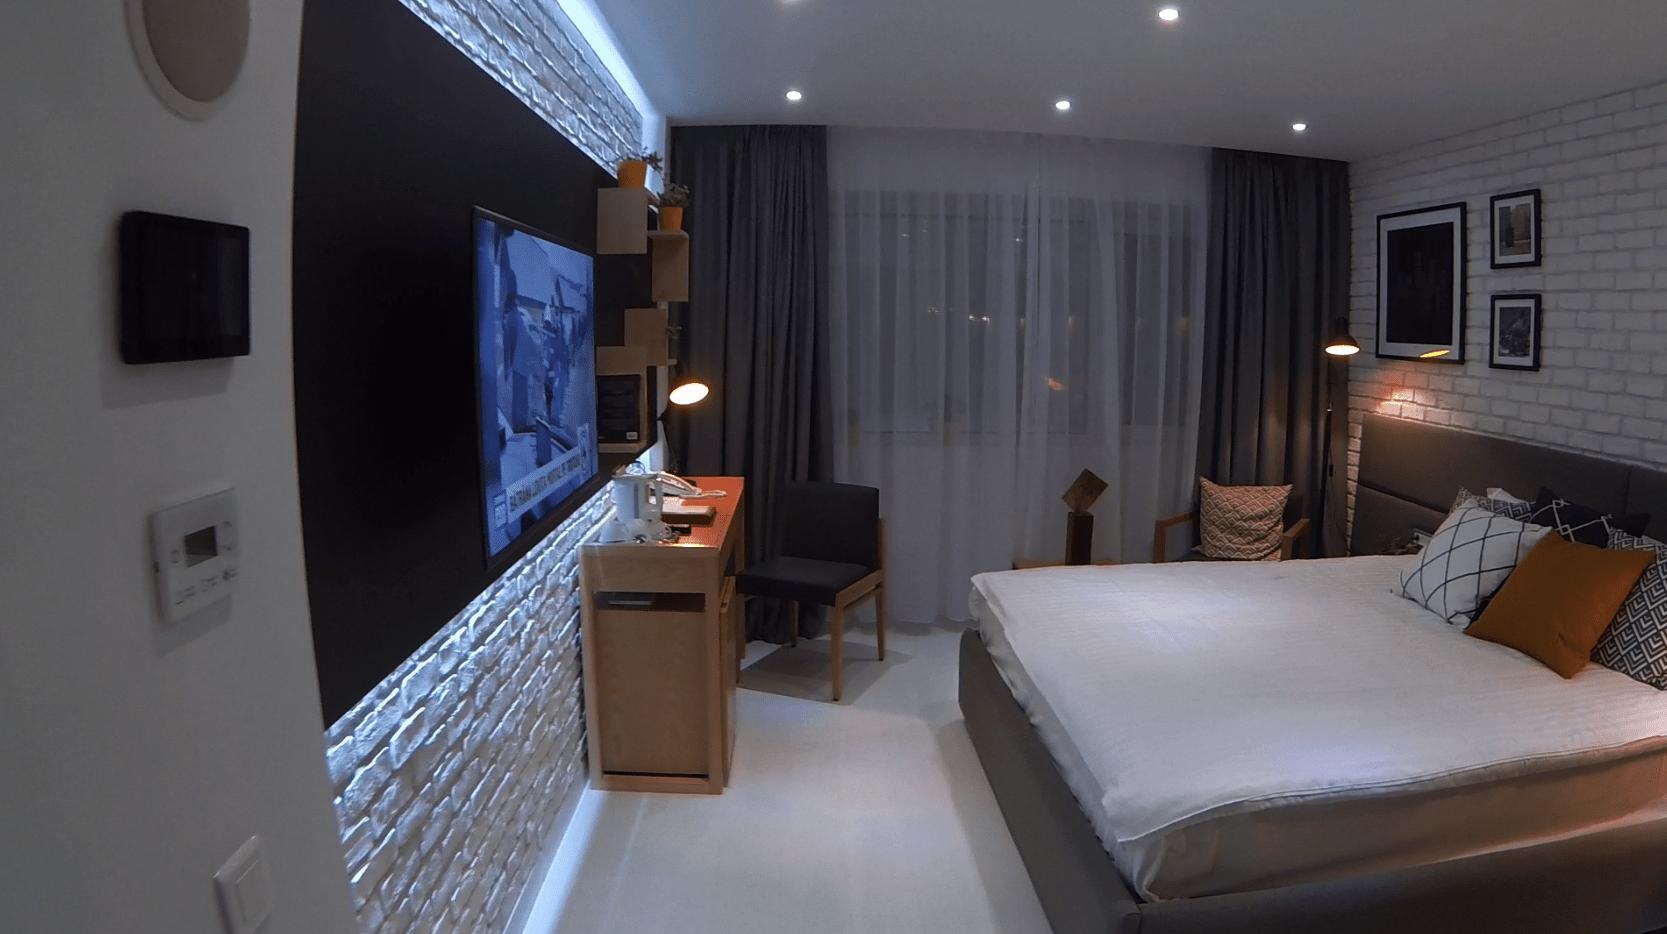 camera hotel bucuresti design interior stil loft. Black Bedroom Furniture Sets. Home Design Ideas